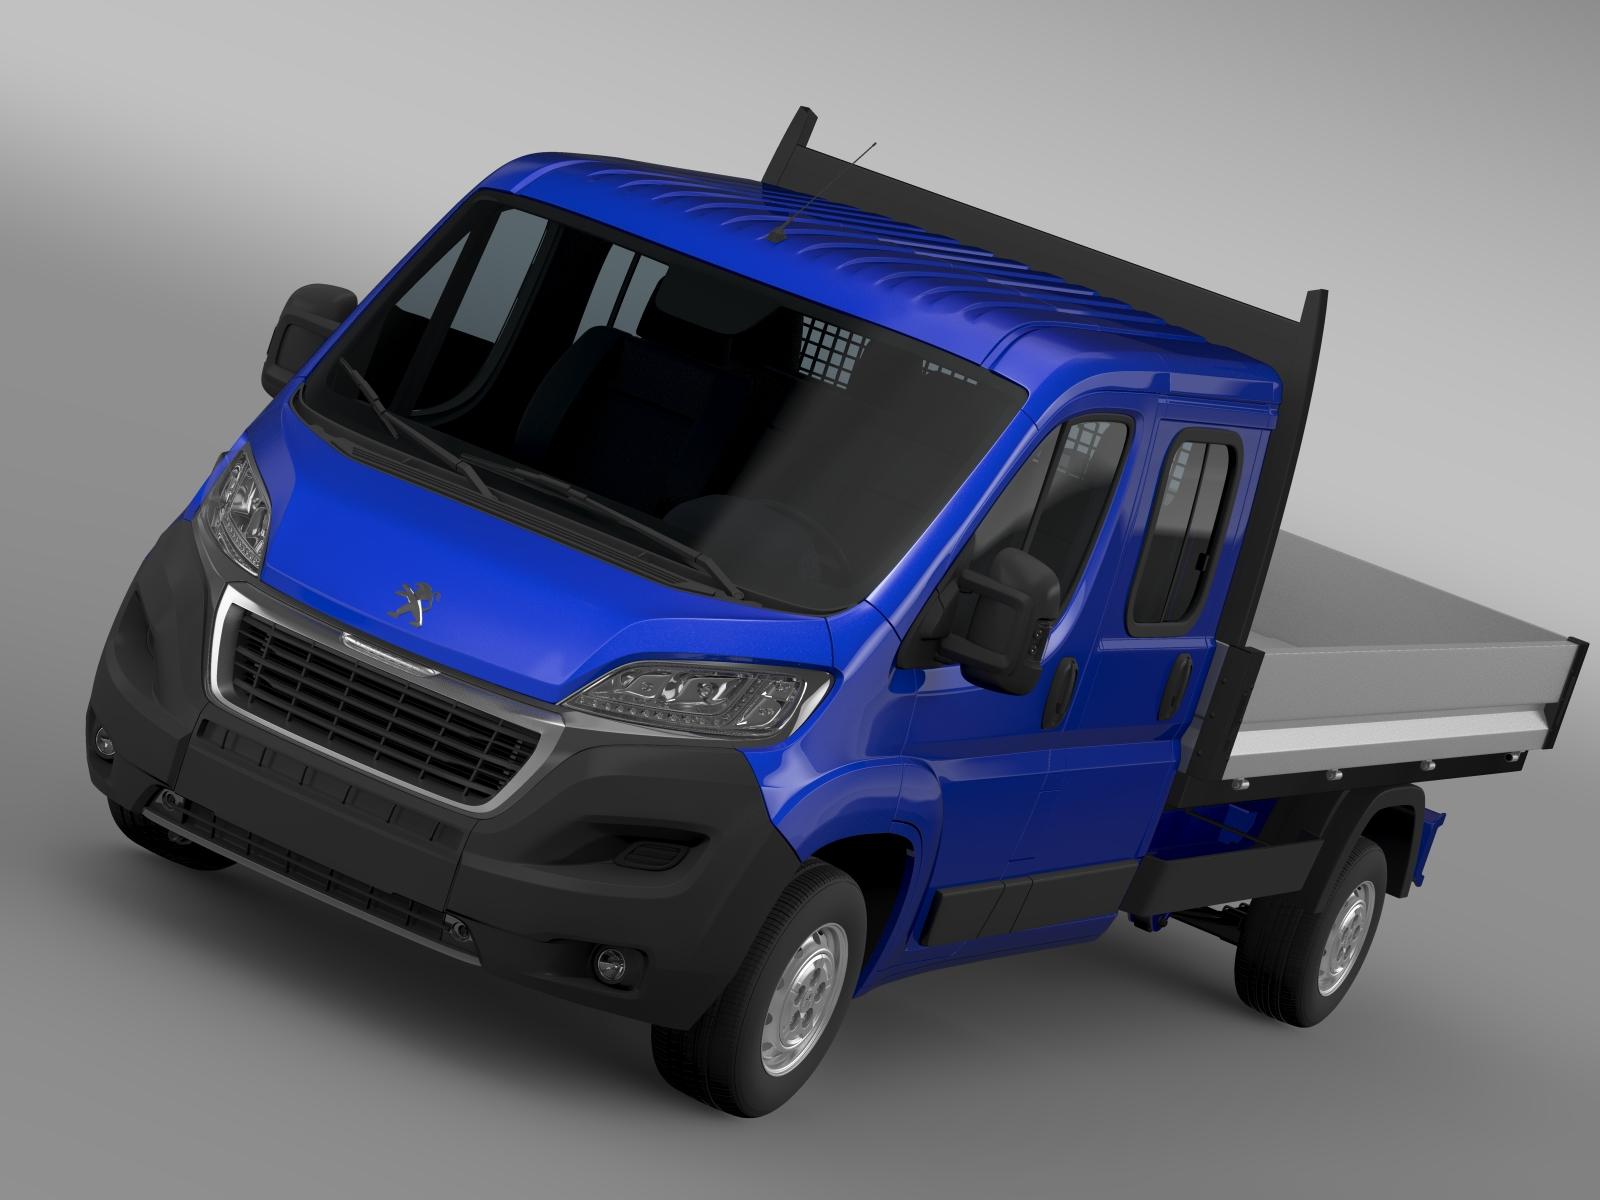 peugeot boxer crew cab truck 2016 3d model 3ds max fbx c4d lwo ma mb hrc xsi obj 218762